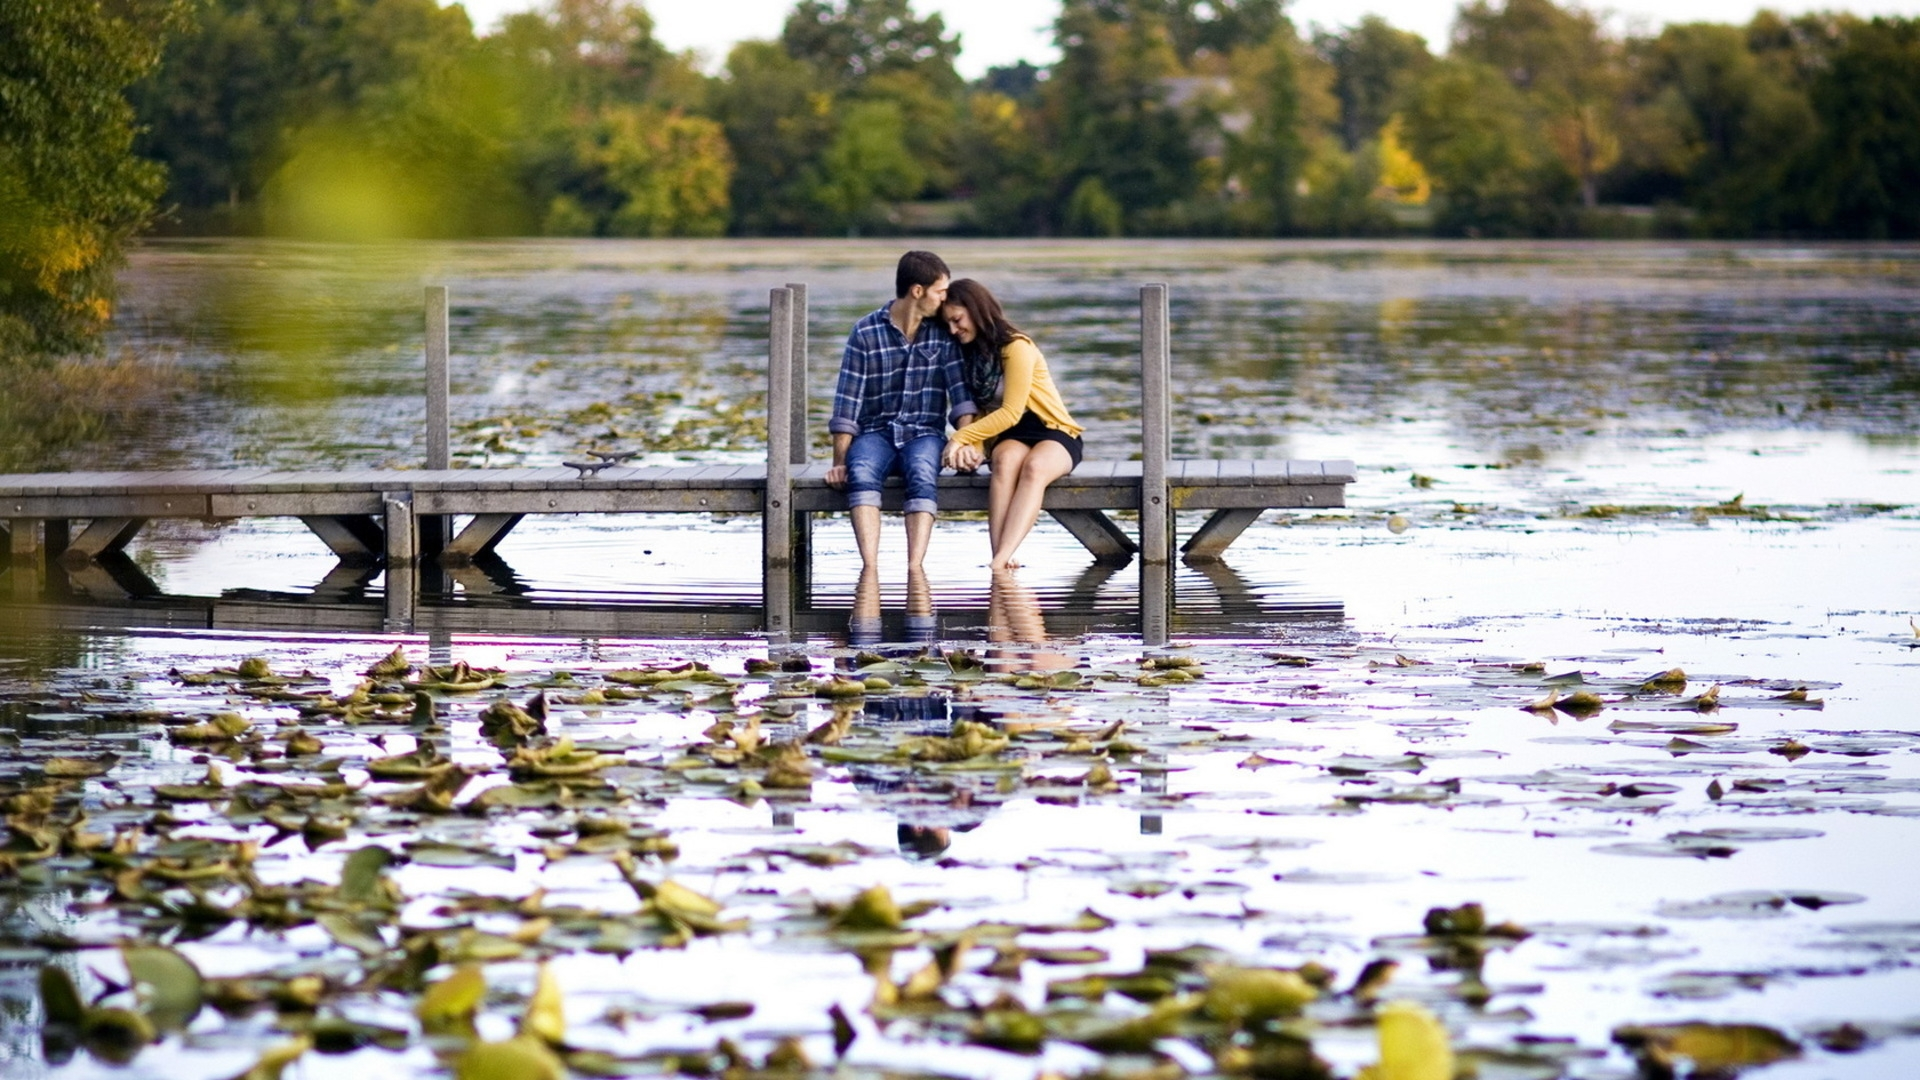 Romantic-Couple-Love-Wallpaper For PC